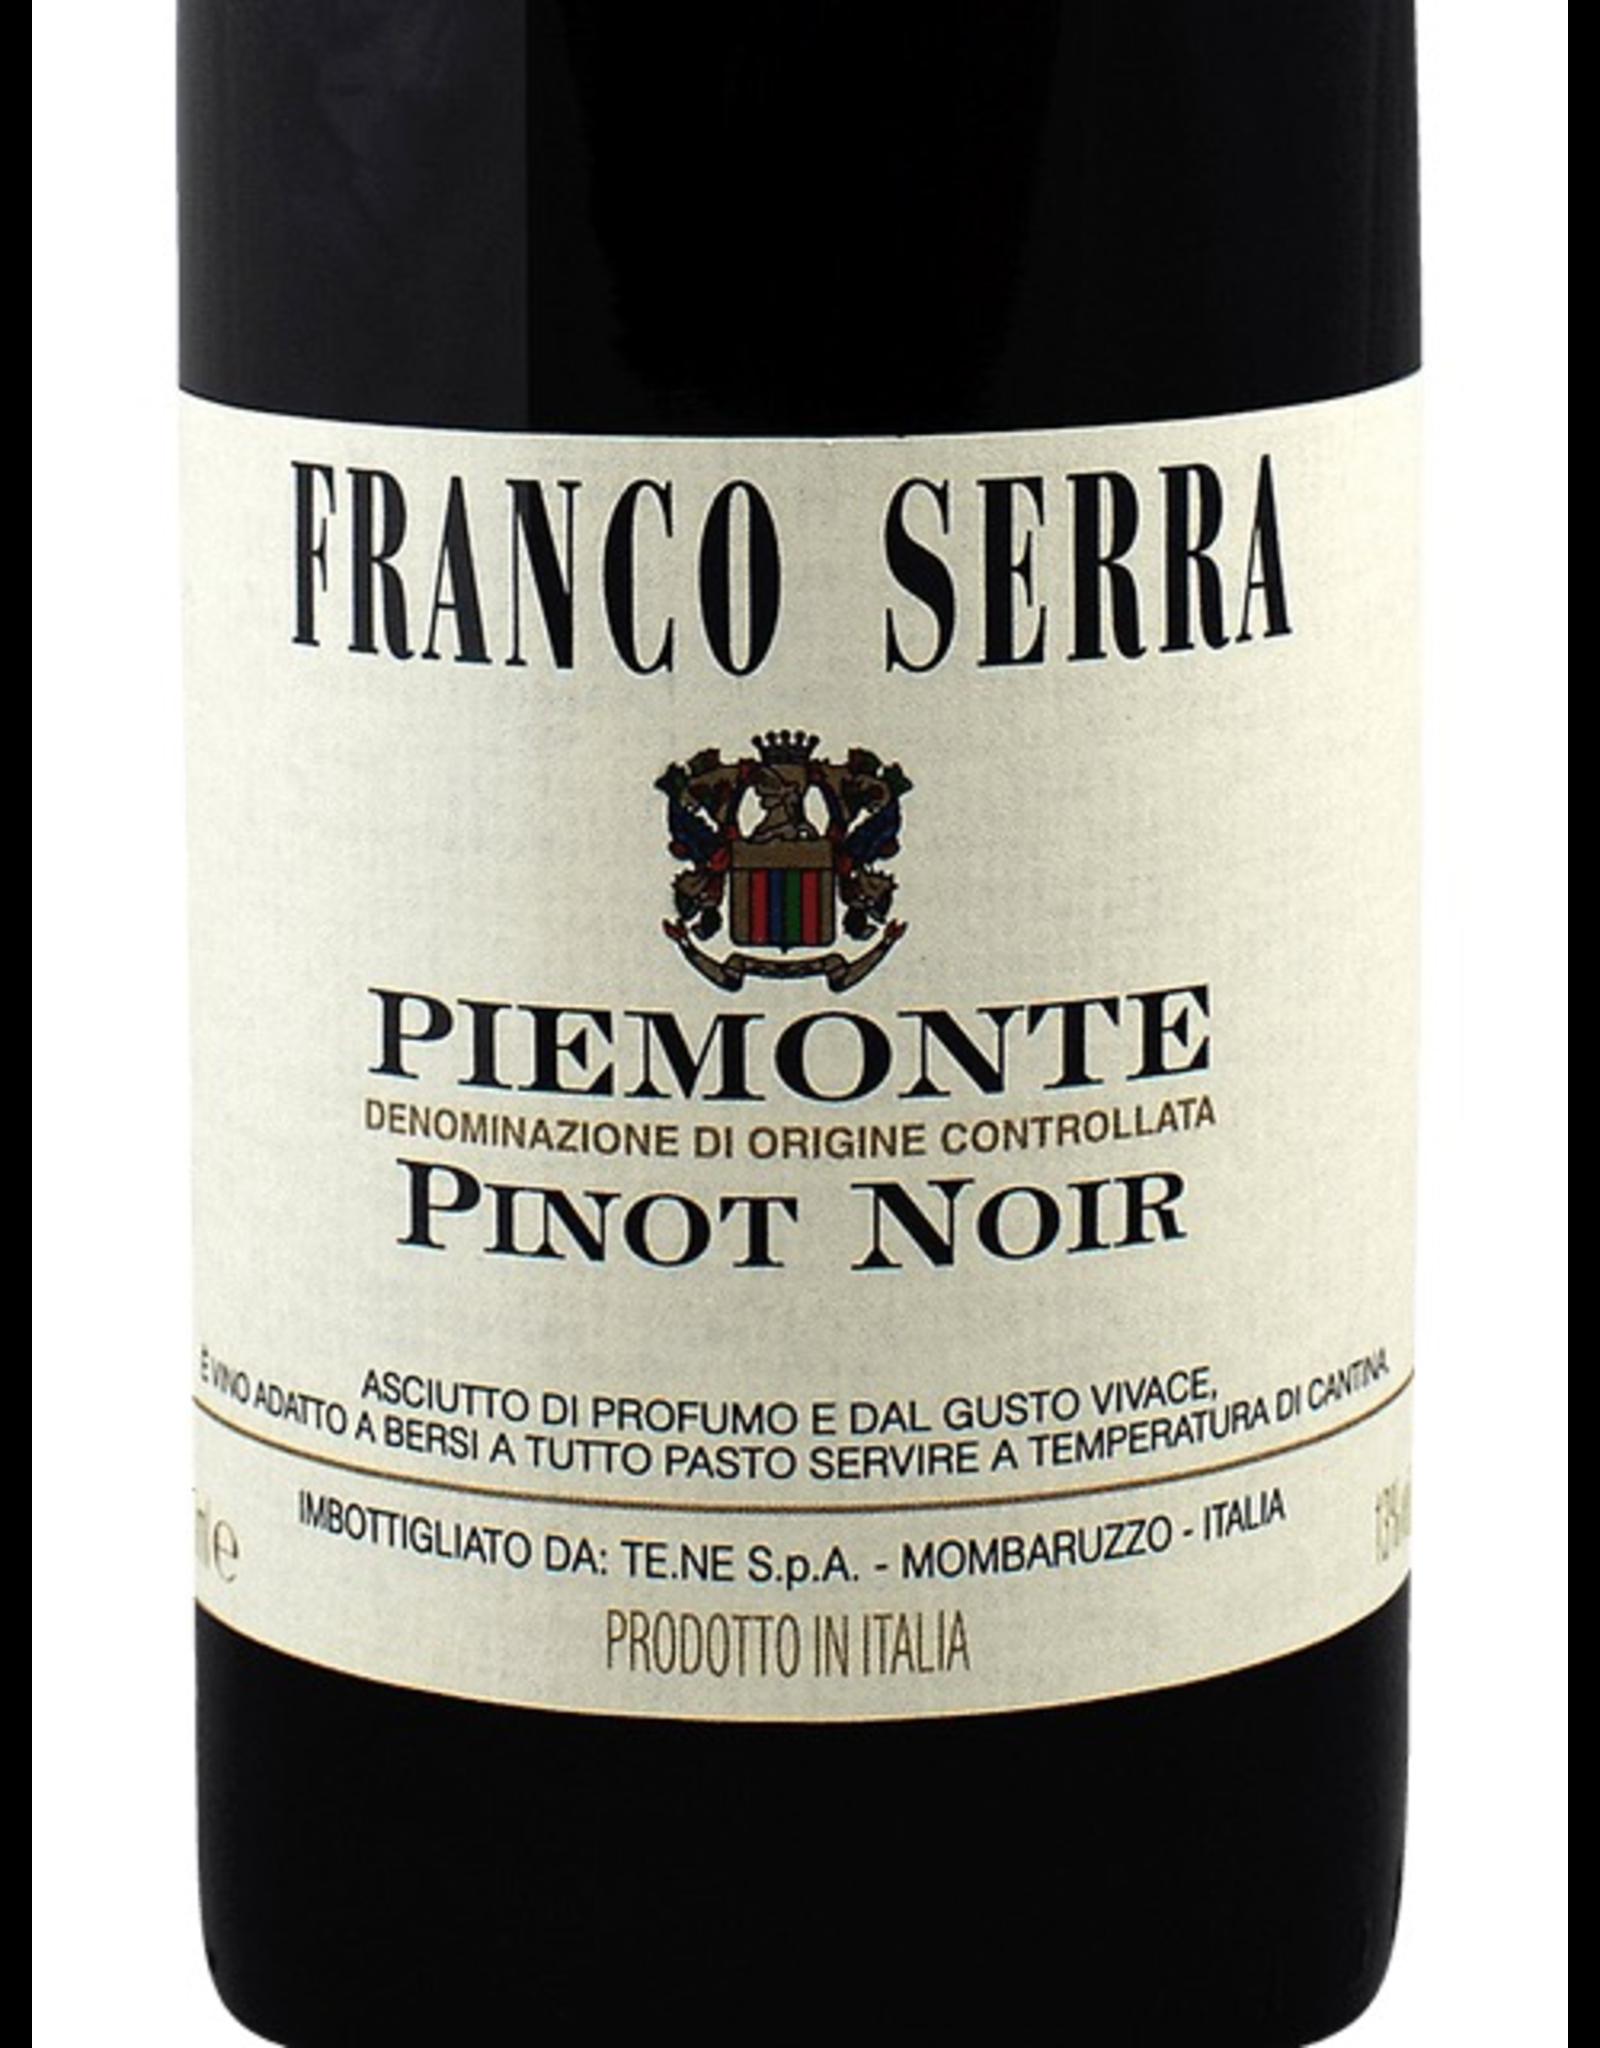 Red Wine 2017, Franco Serra, Pinot Noir, Mombaruzzo, Piemonte, Italy, 13% Alc, CTnr